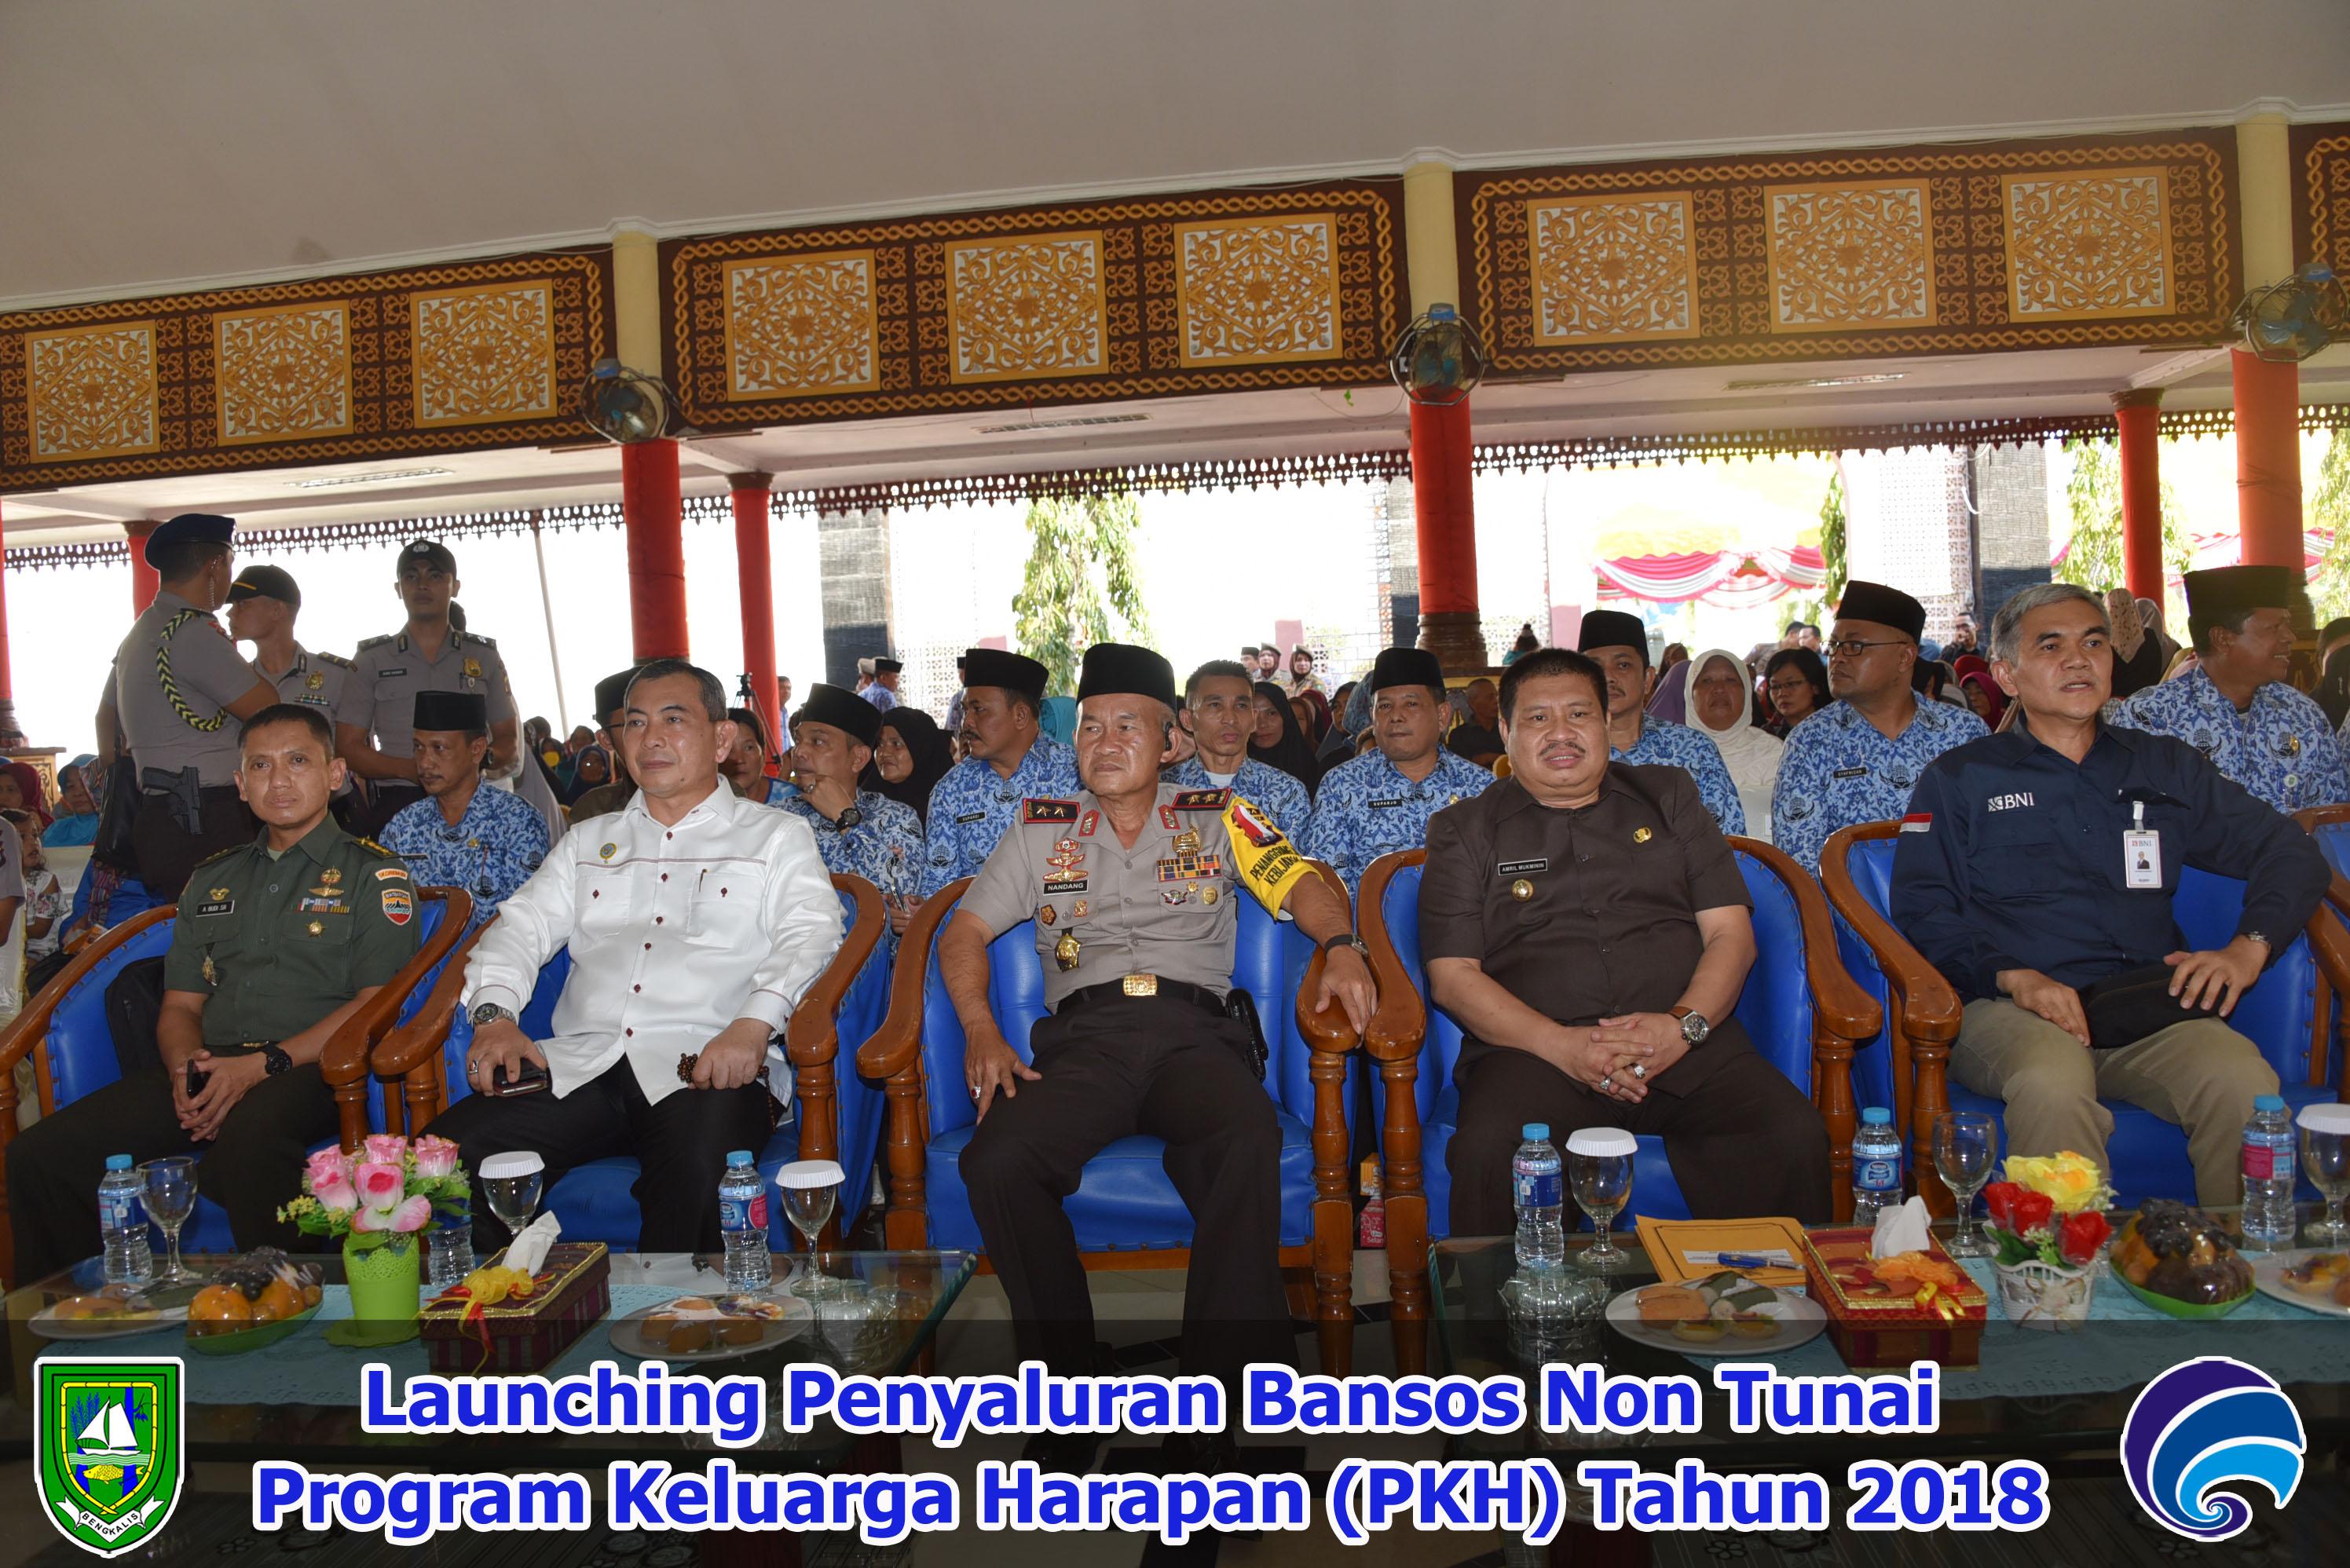 Launching Penyaluran Bansos Non Tunai PKH Tahun 2018